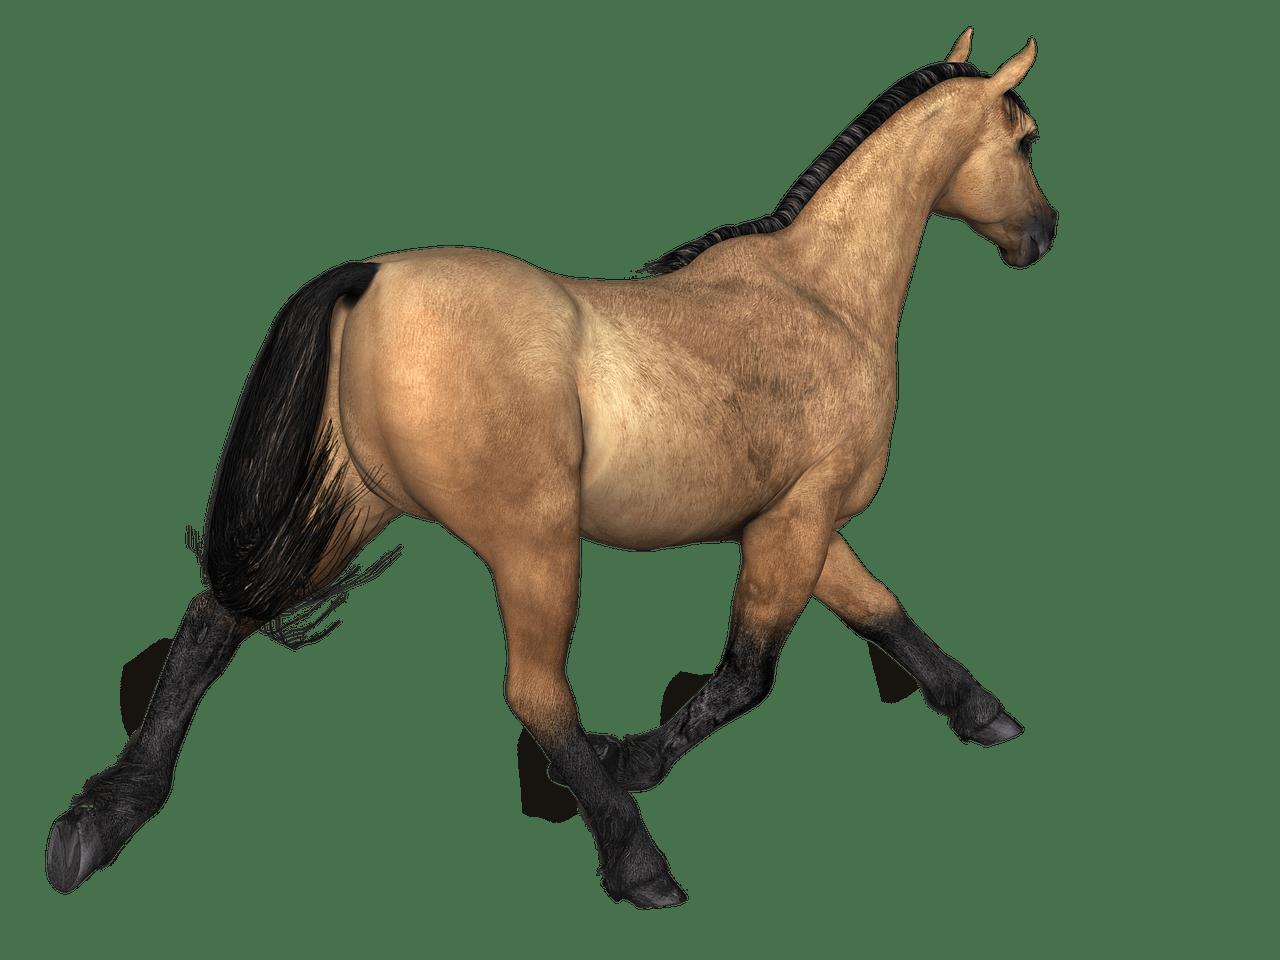 Clipart horse rear. Horses brown view transparent